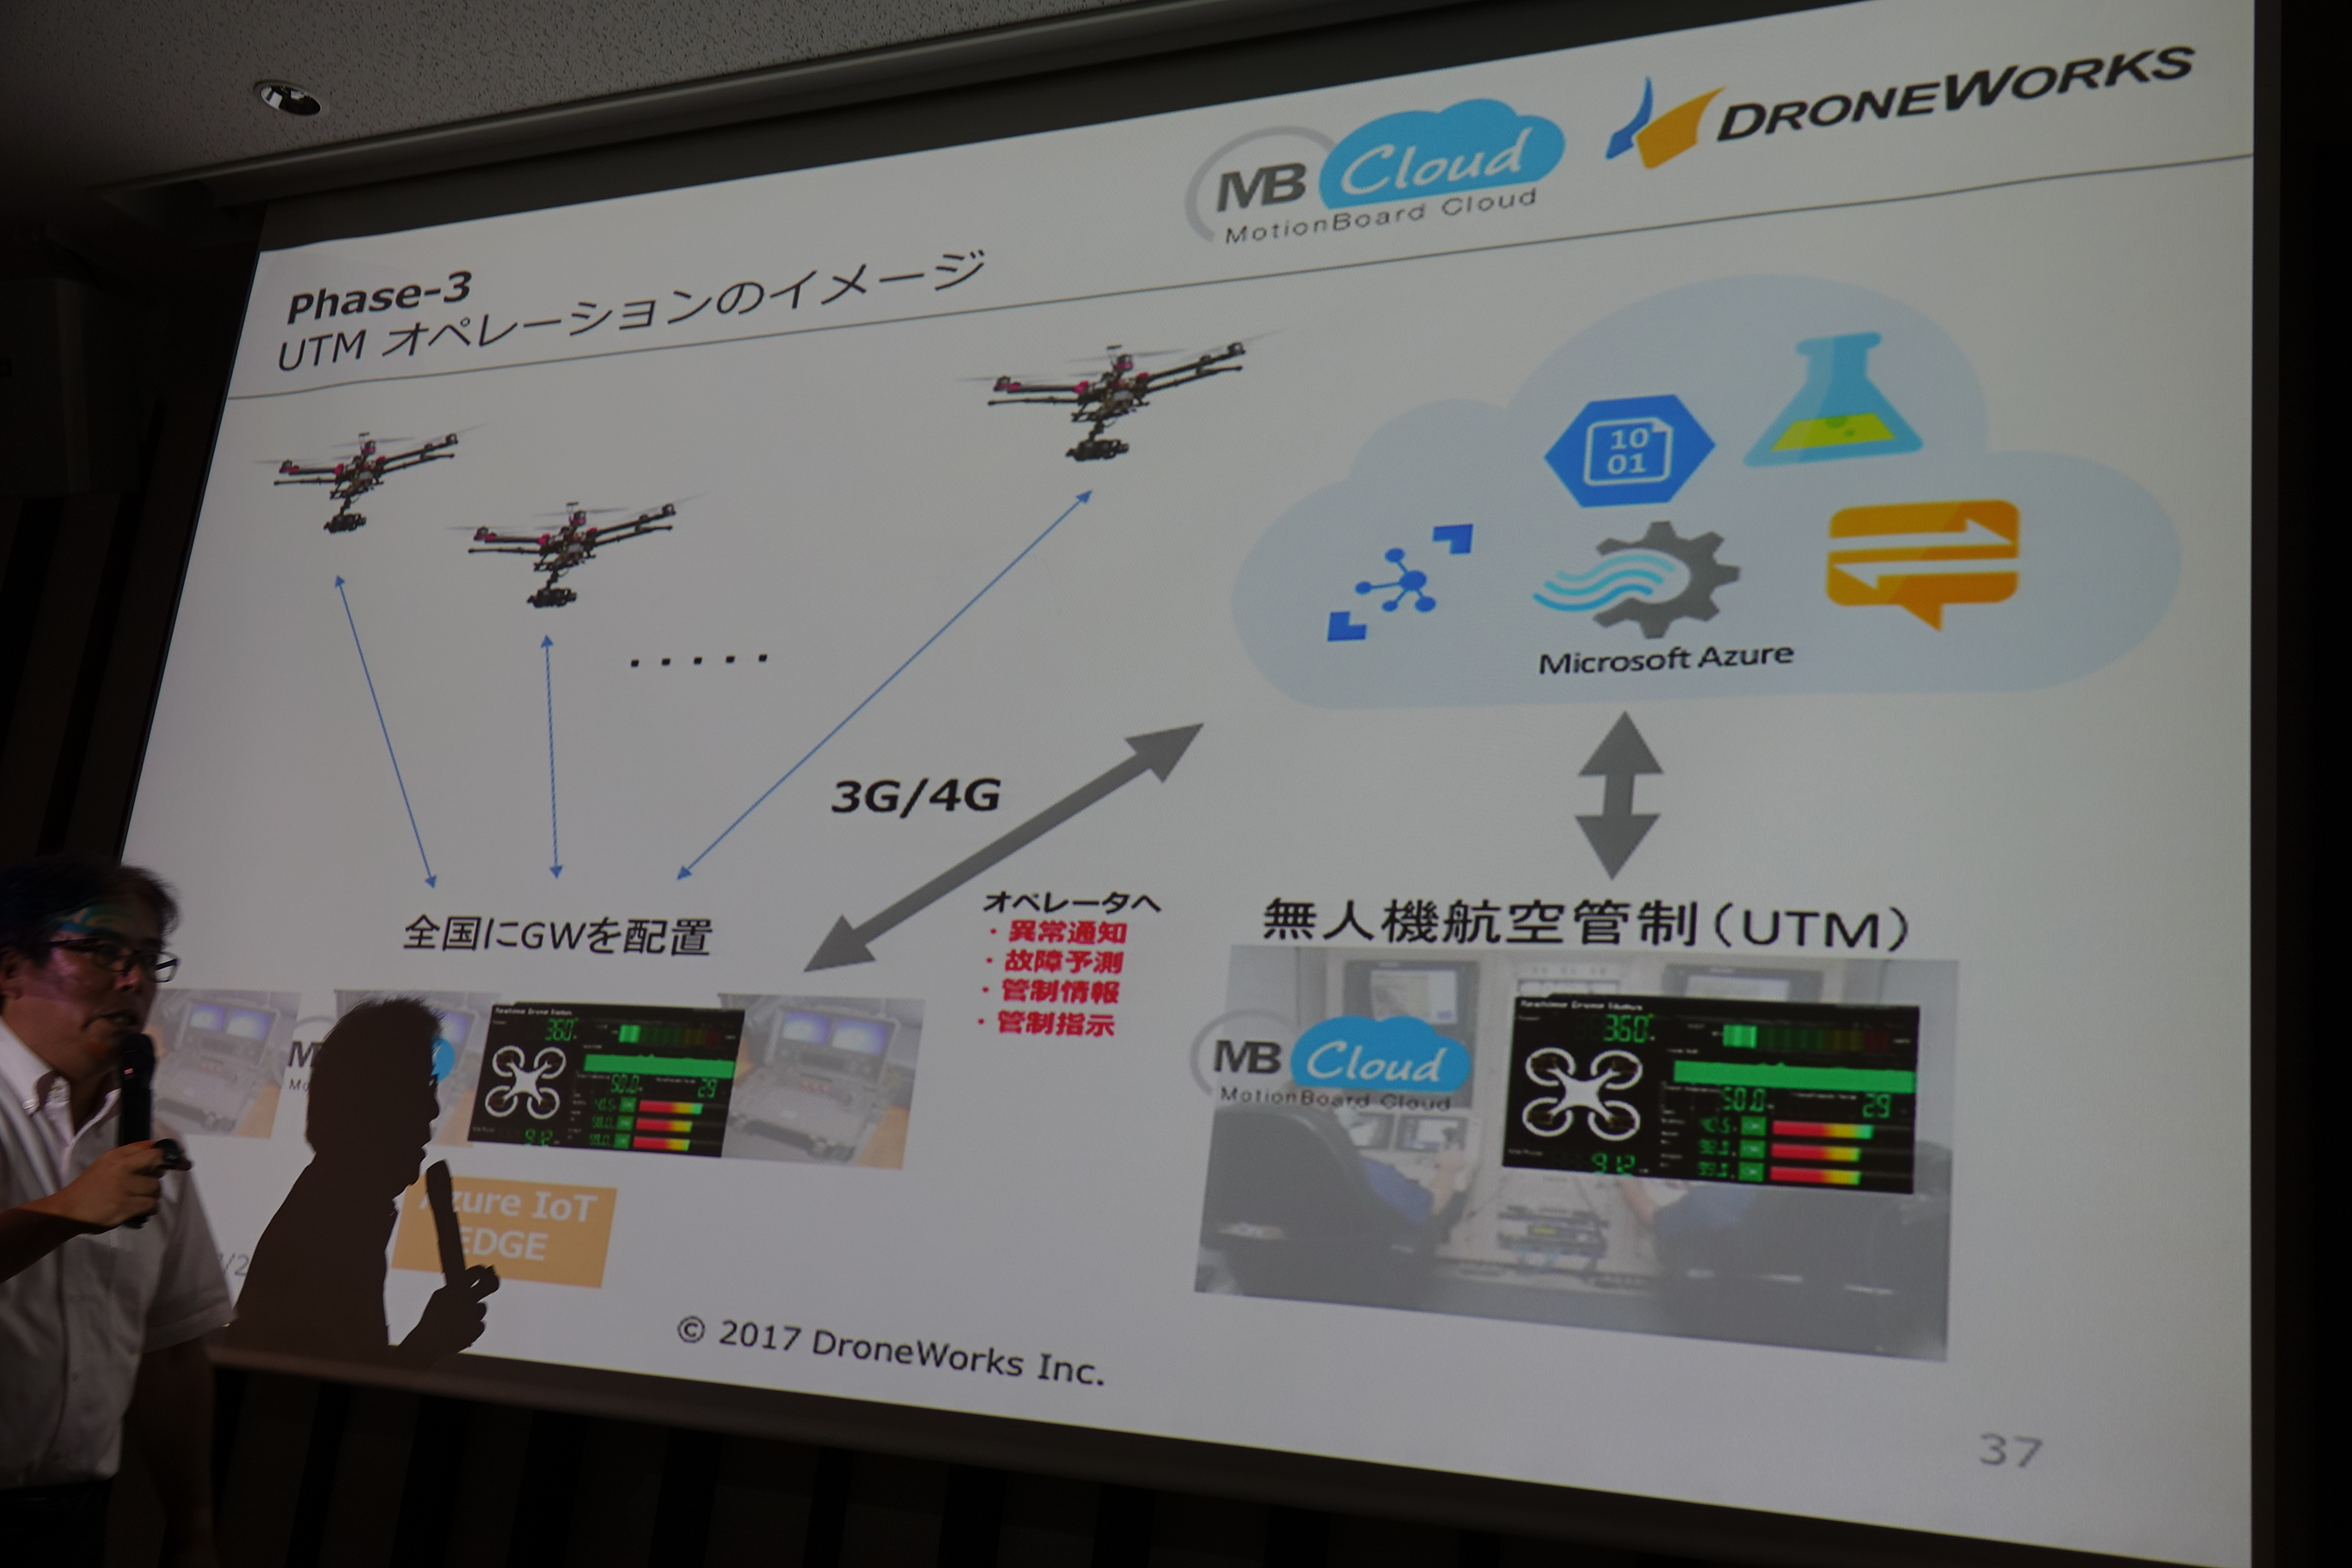 MS IoT推進ラボ ドローンWG ドローンワークス 今村氏 講演